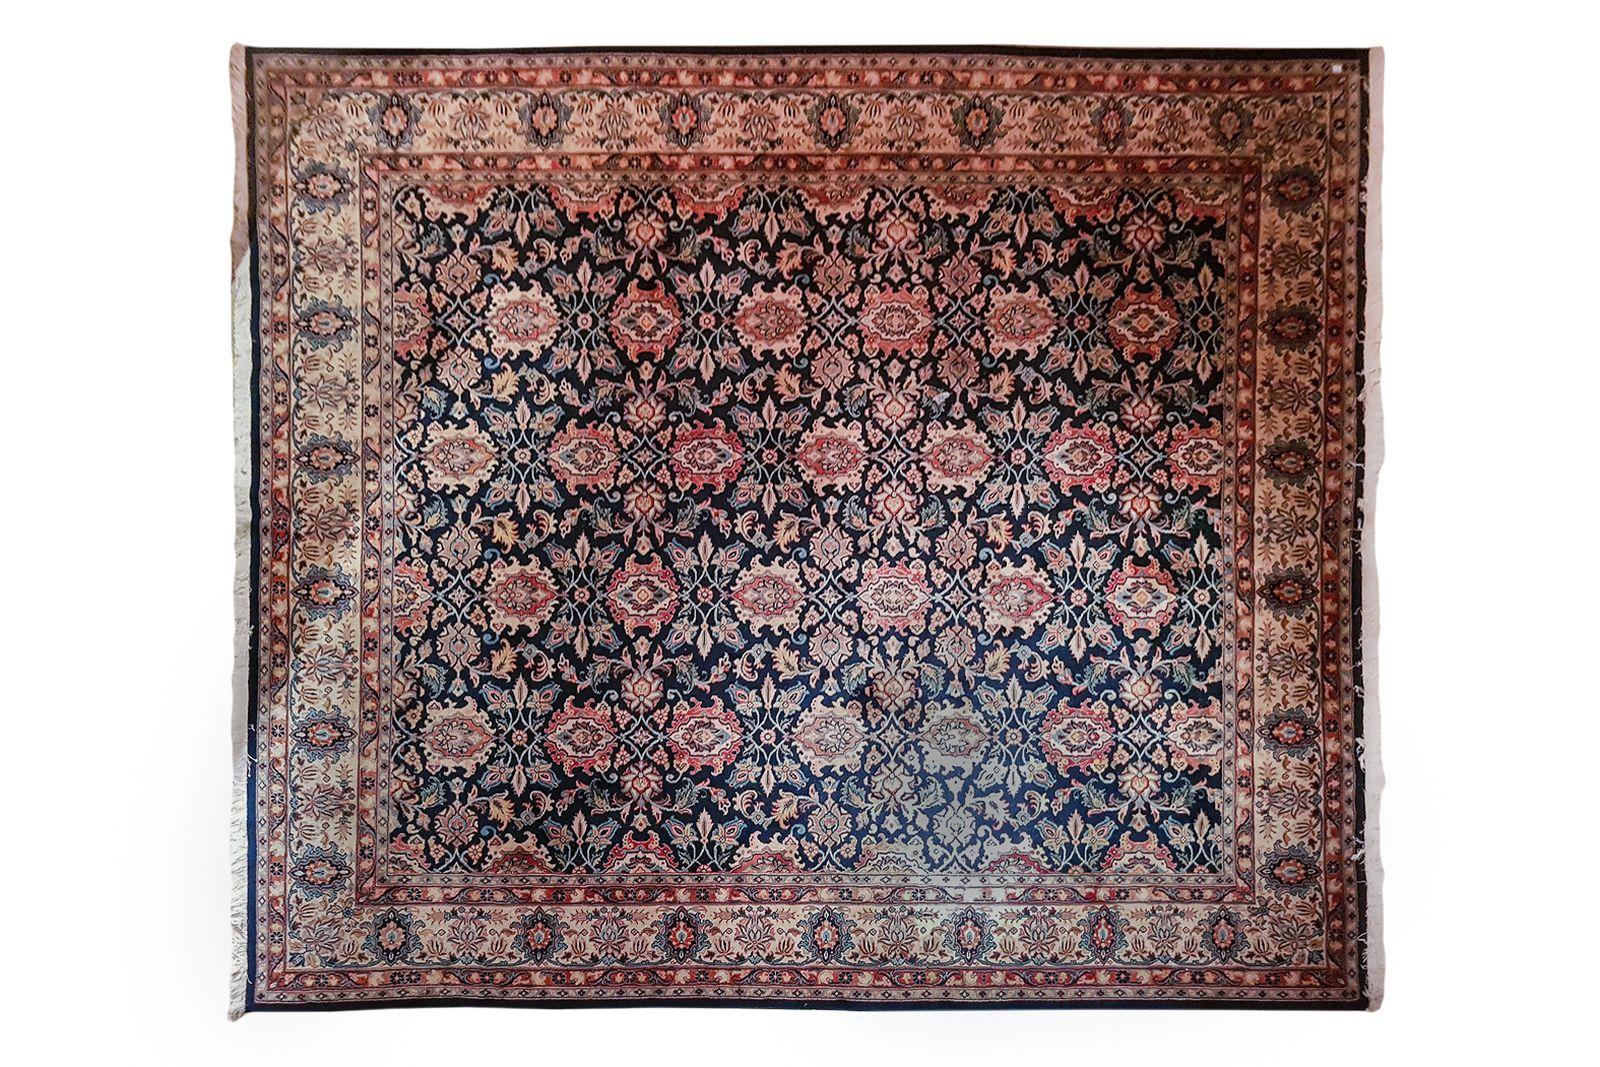 #192 Persian carpet | Perserteppich  Image